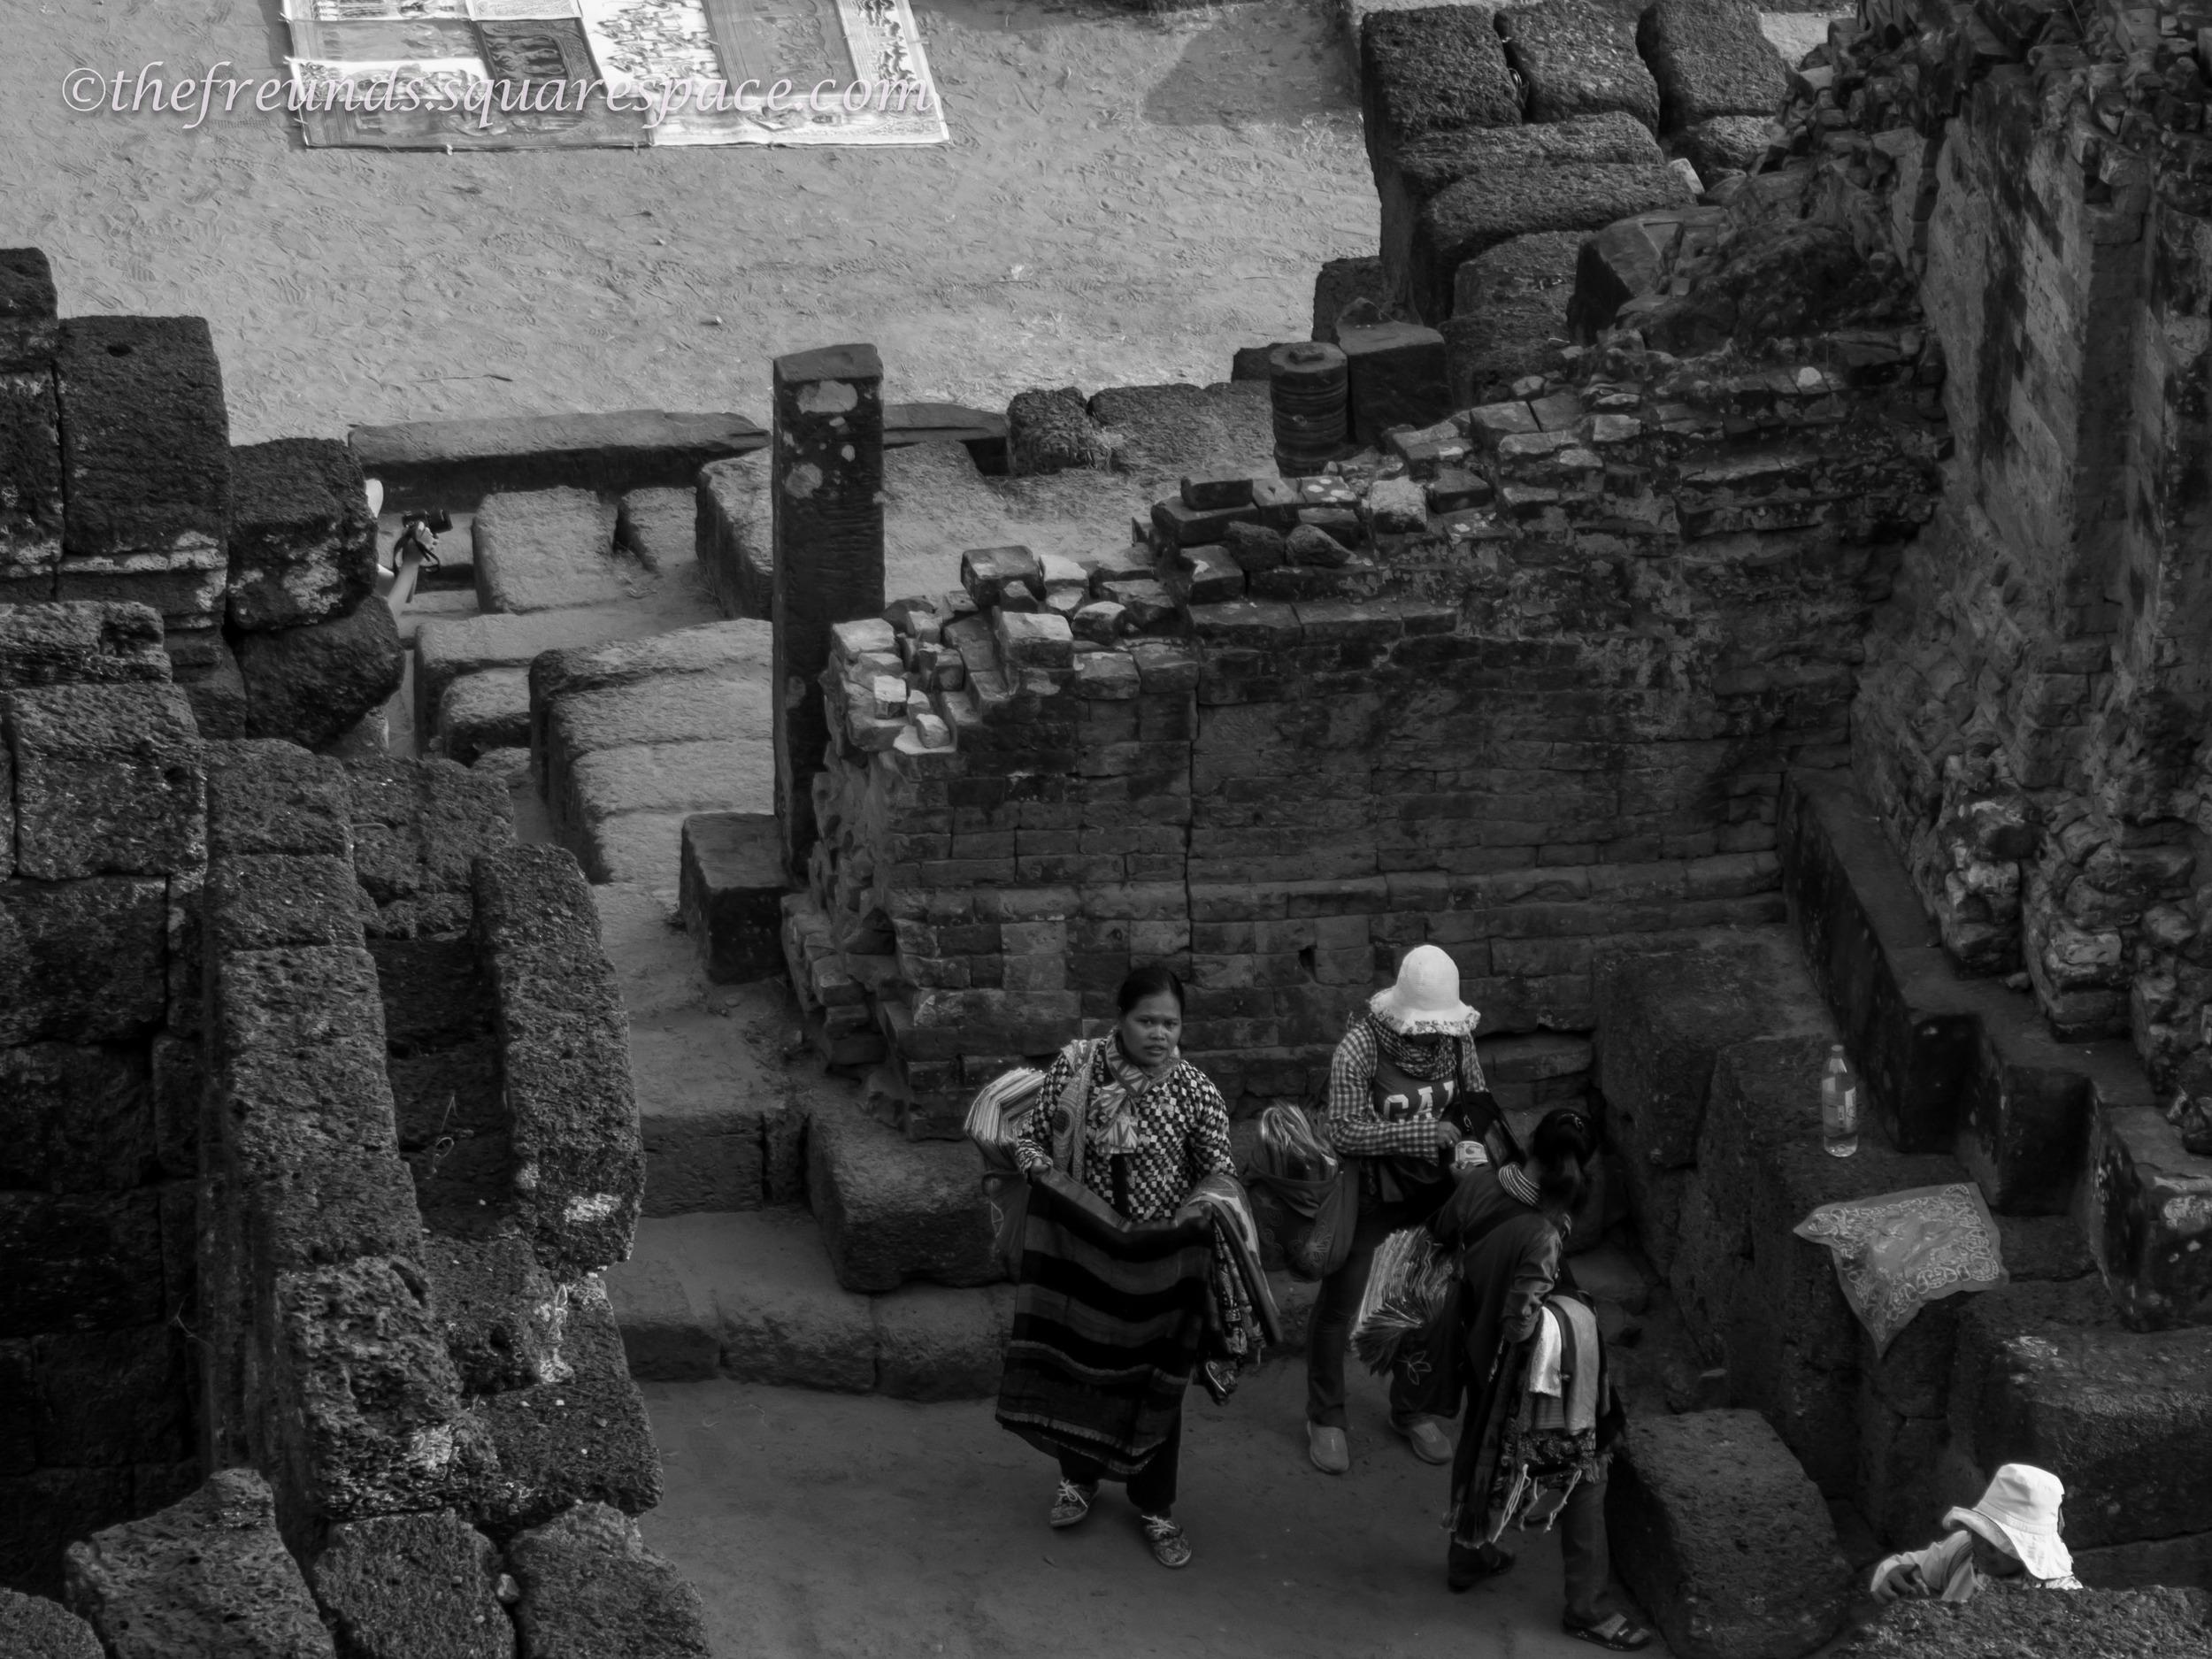 Angkor_SiemReap-46.jpg